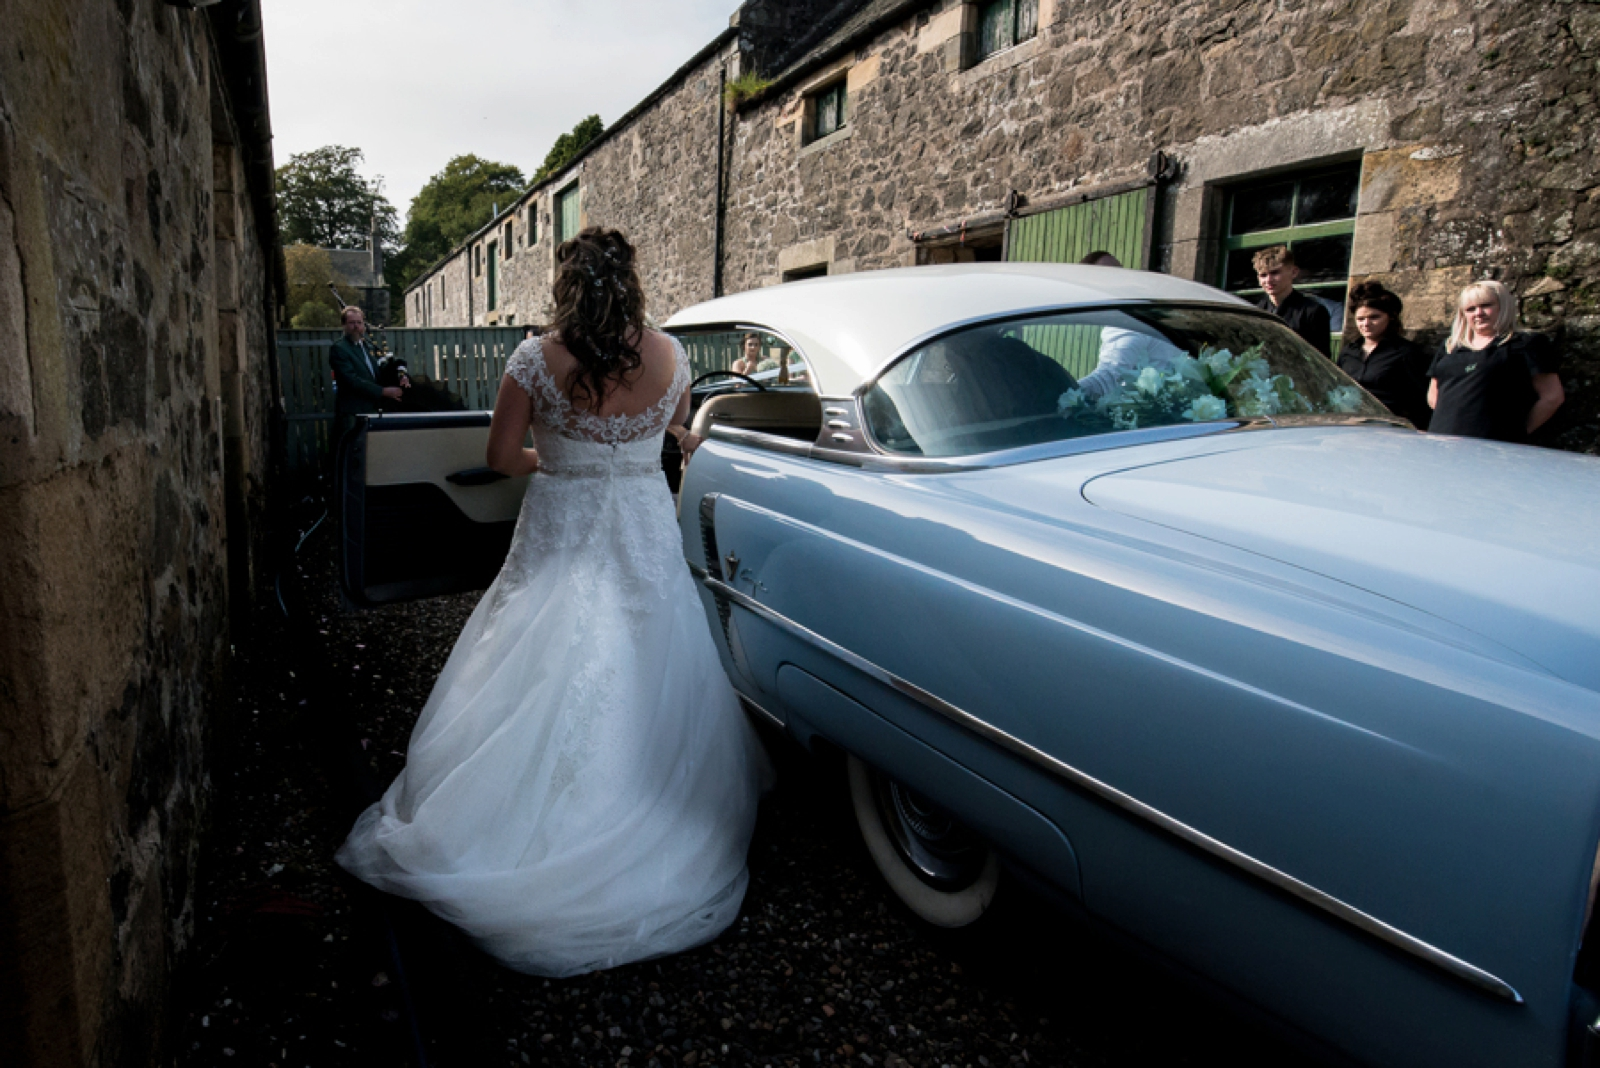 2017-09-23 (Mearns) Pratis Farm Wedding Photography125916.jpg